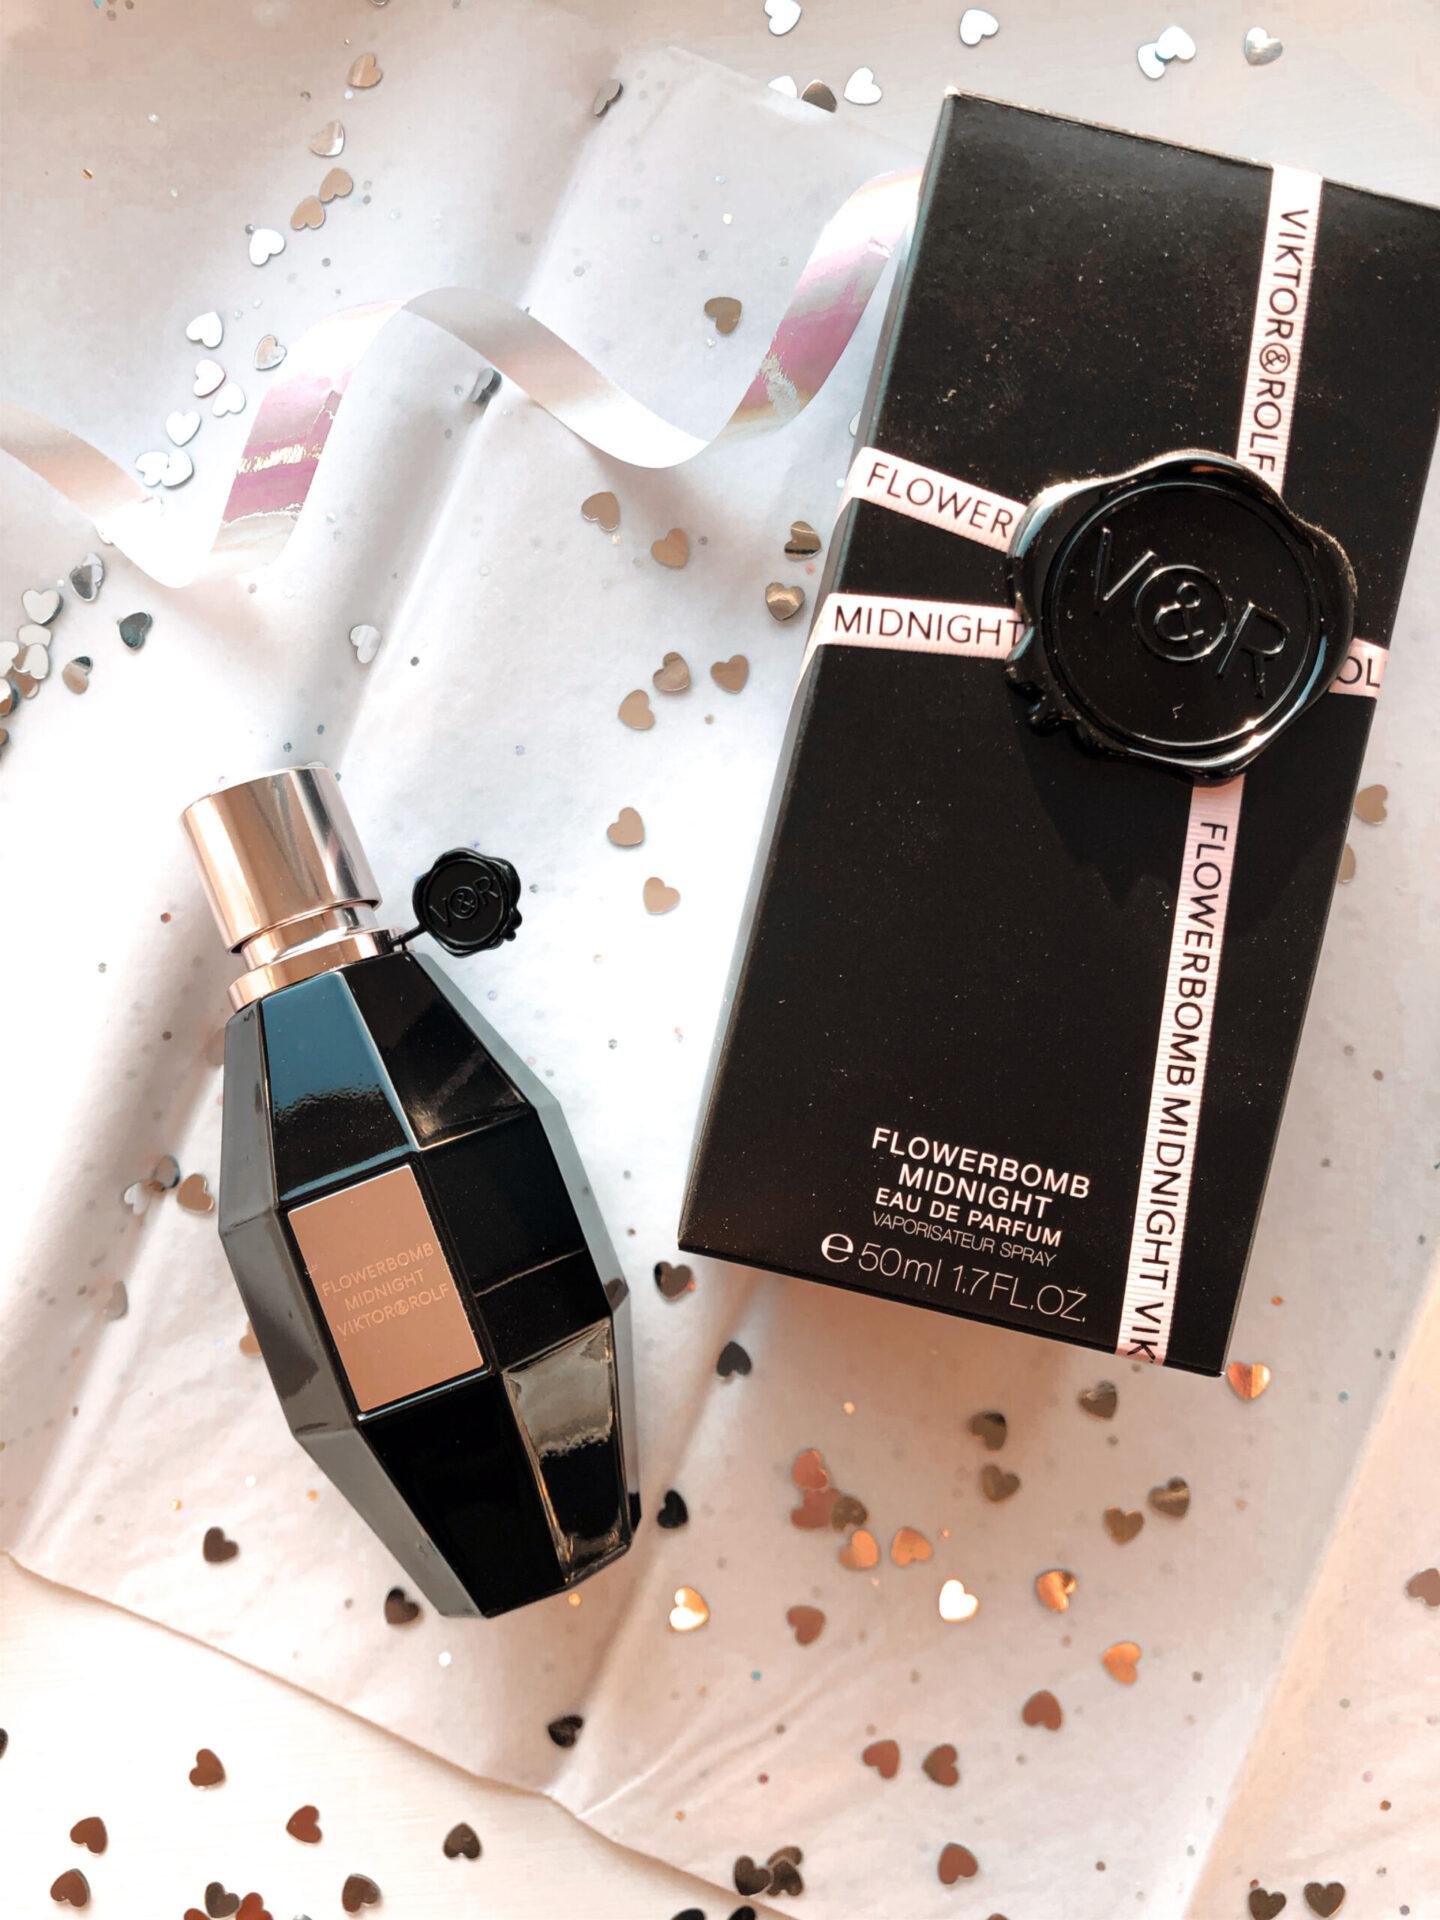 Flowerbomb Midnight Fragrance